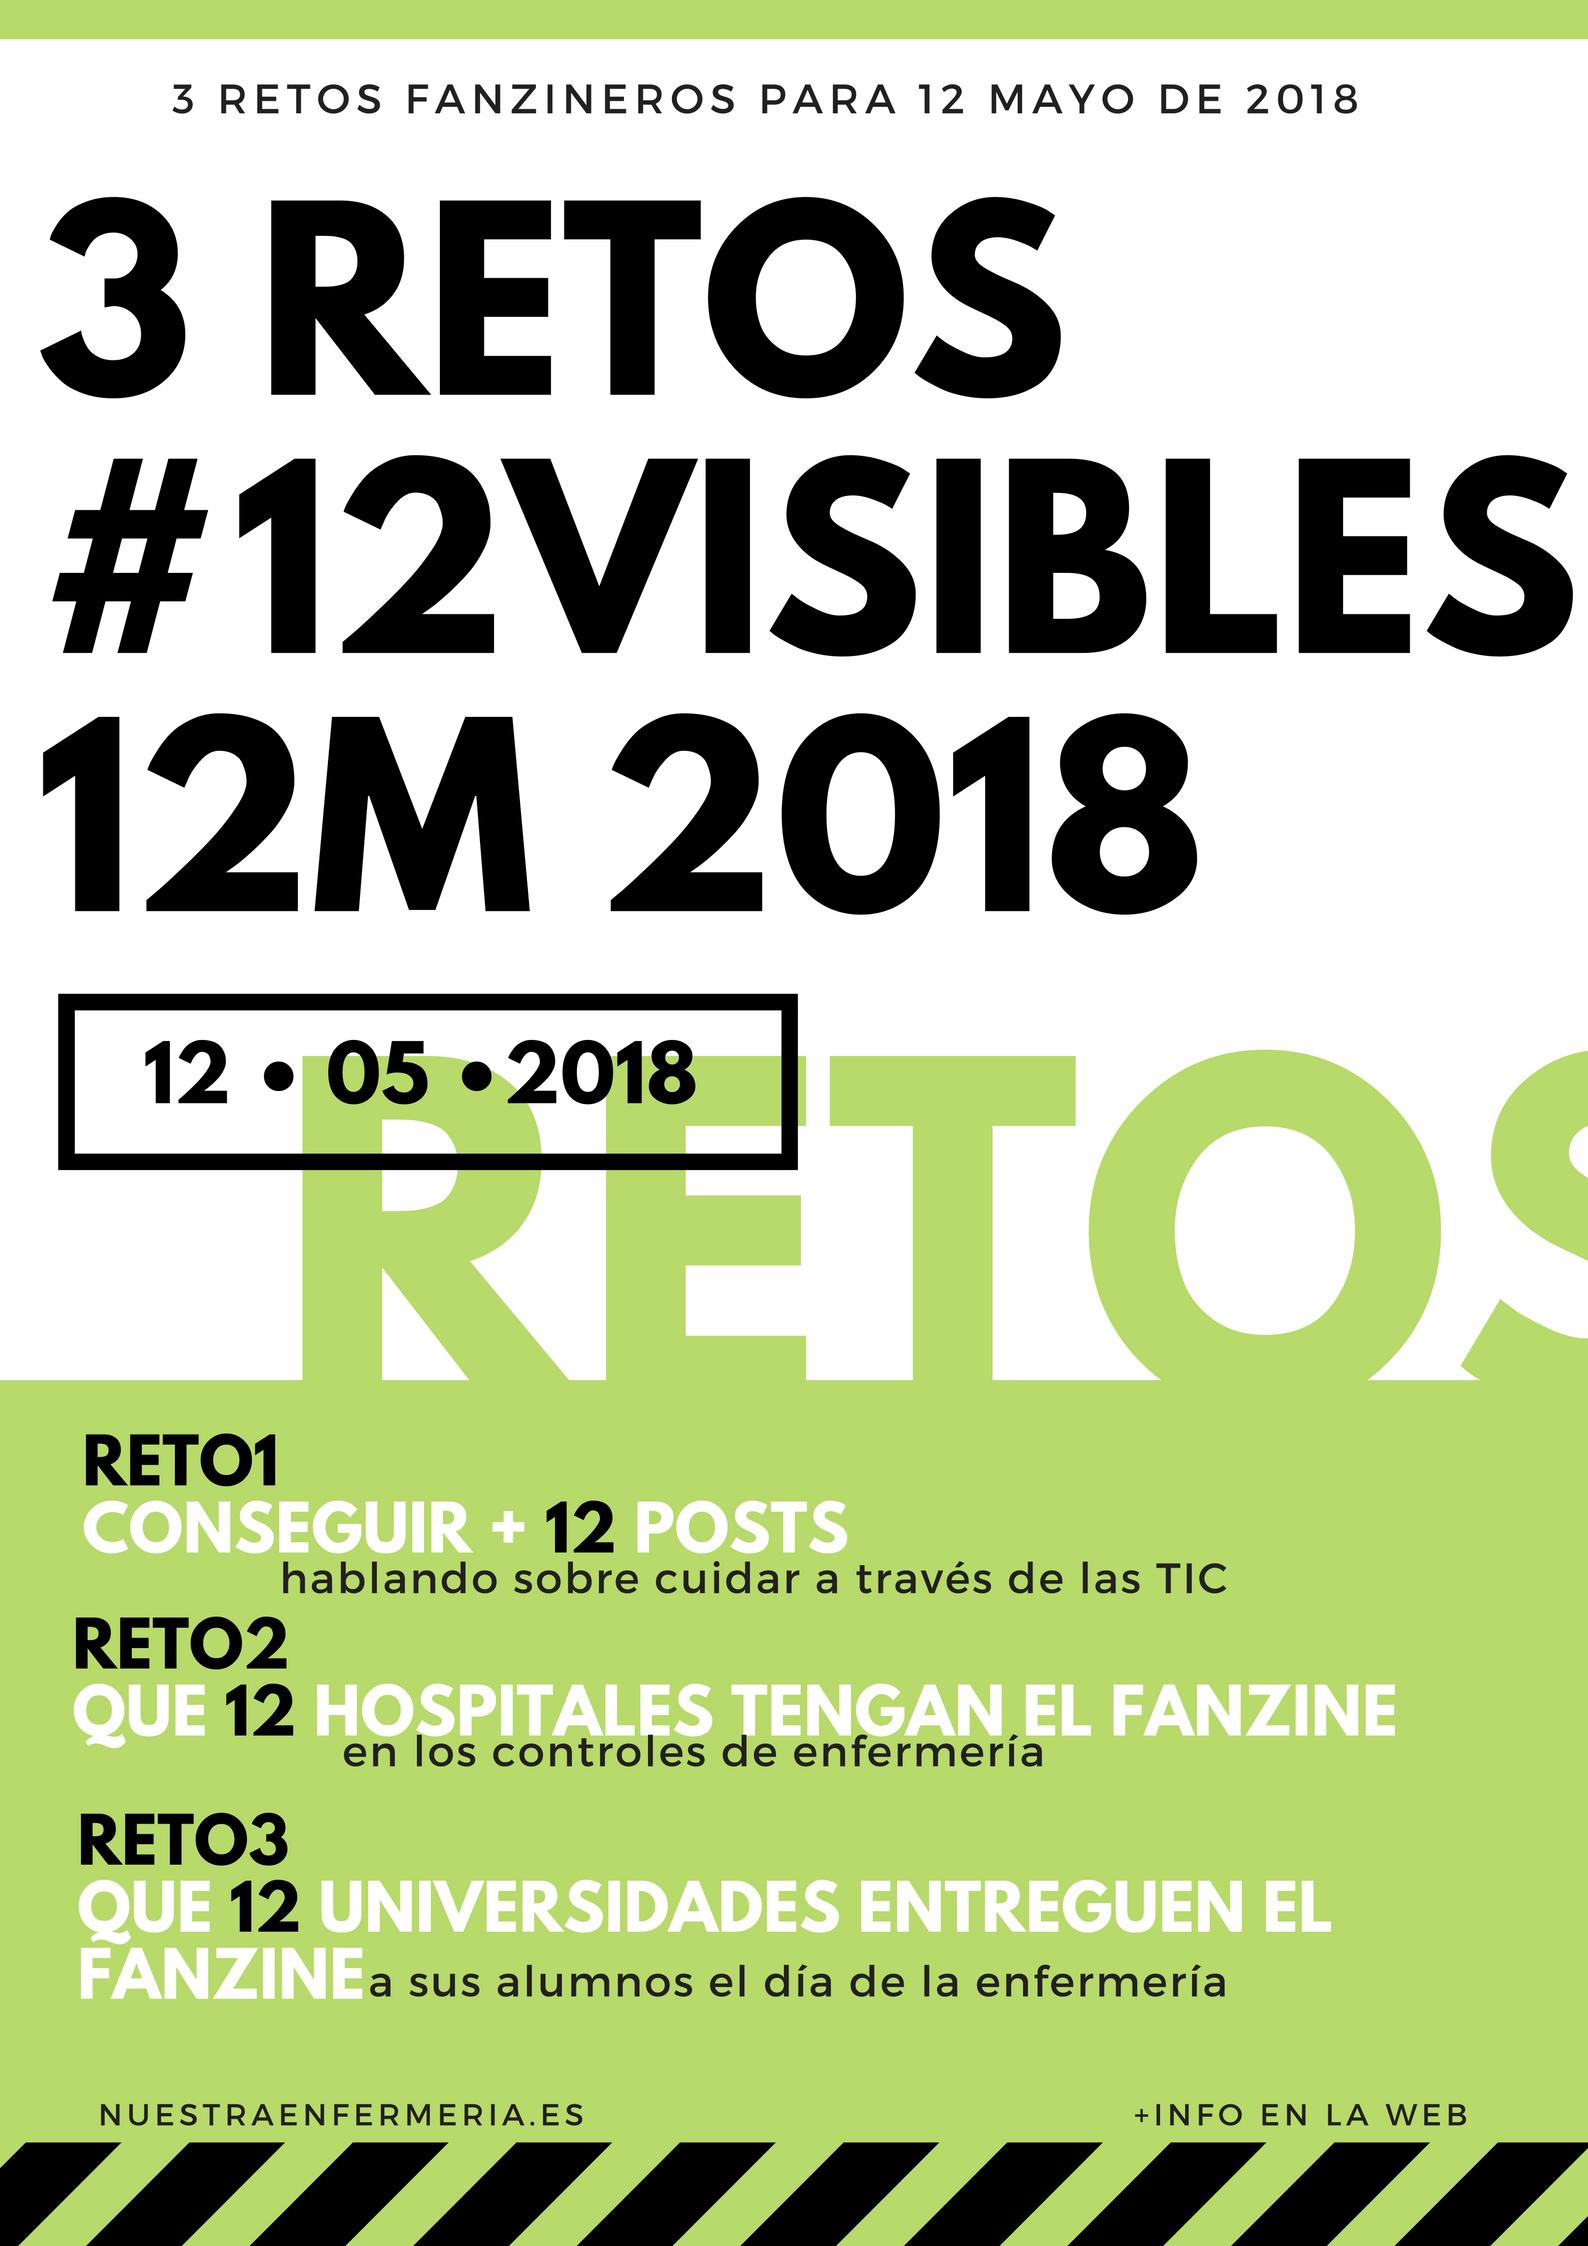 3 Retos Fanzineros #12visibles12M 2018